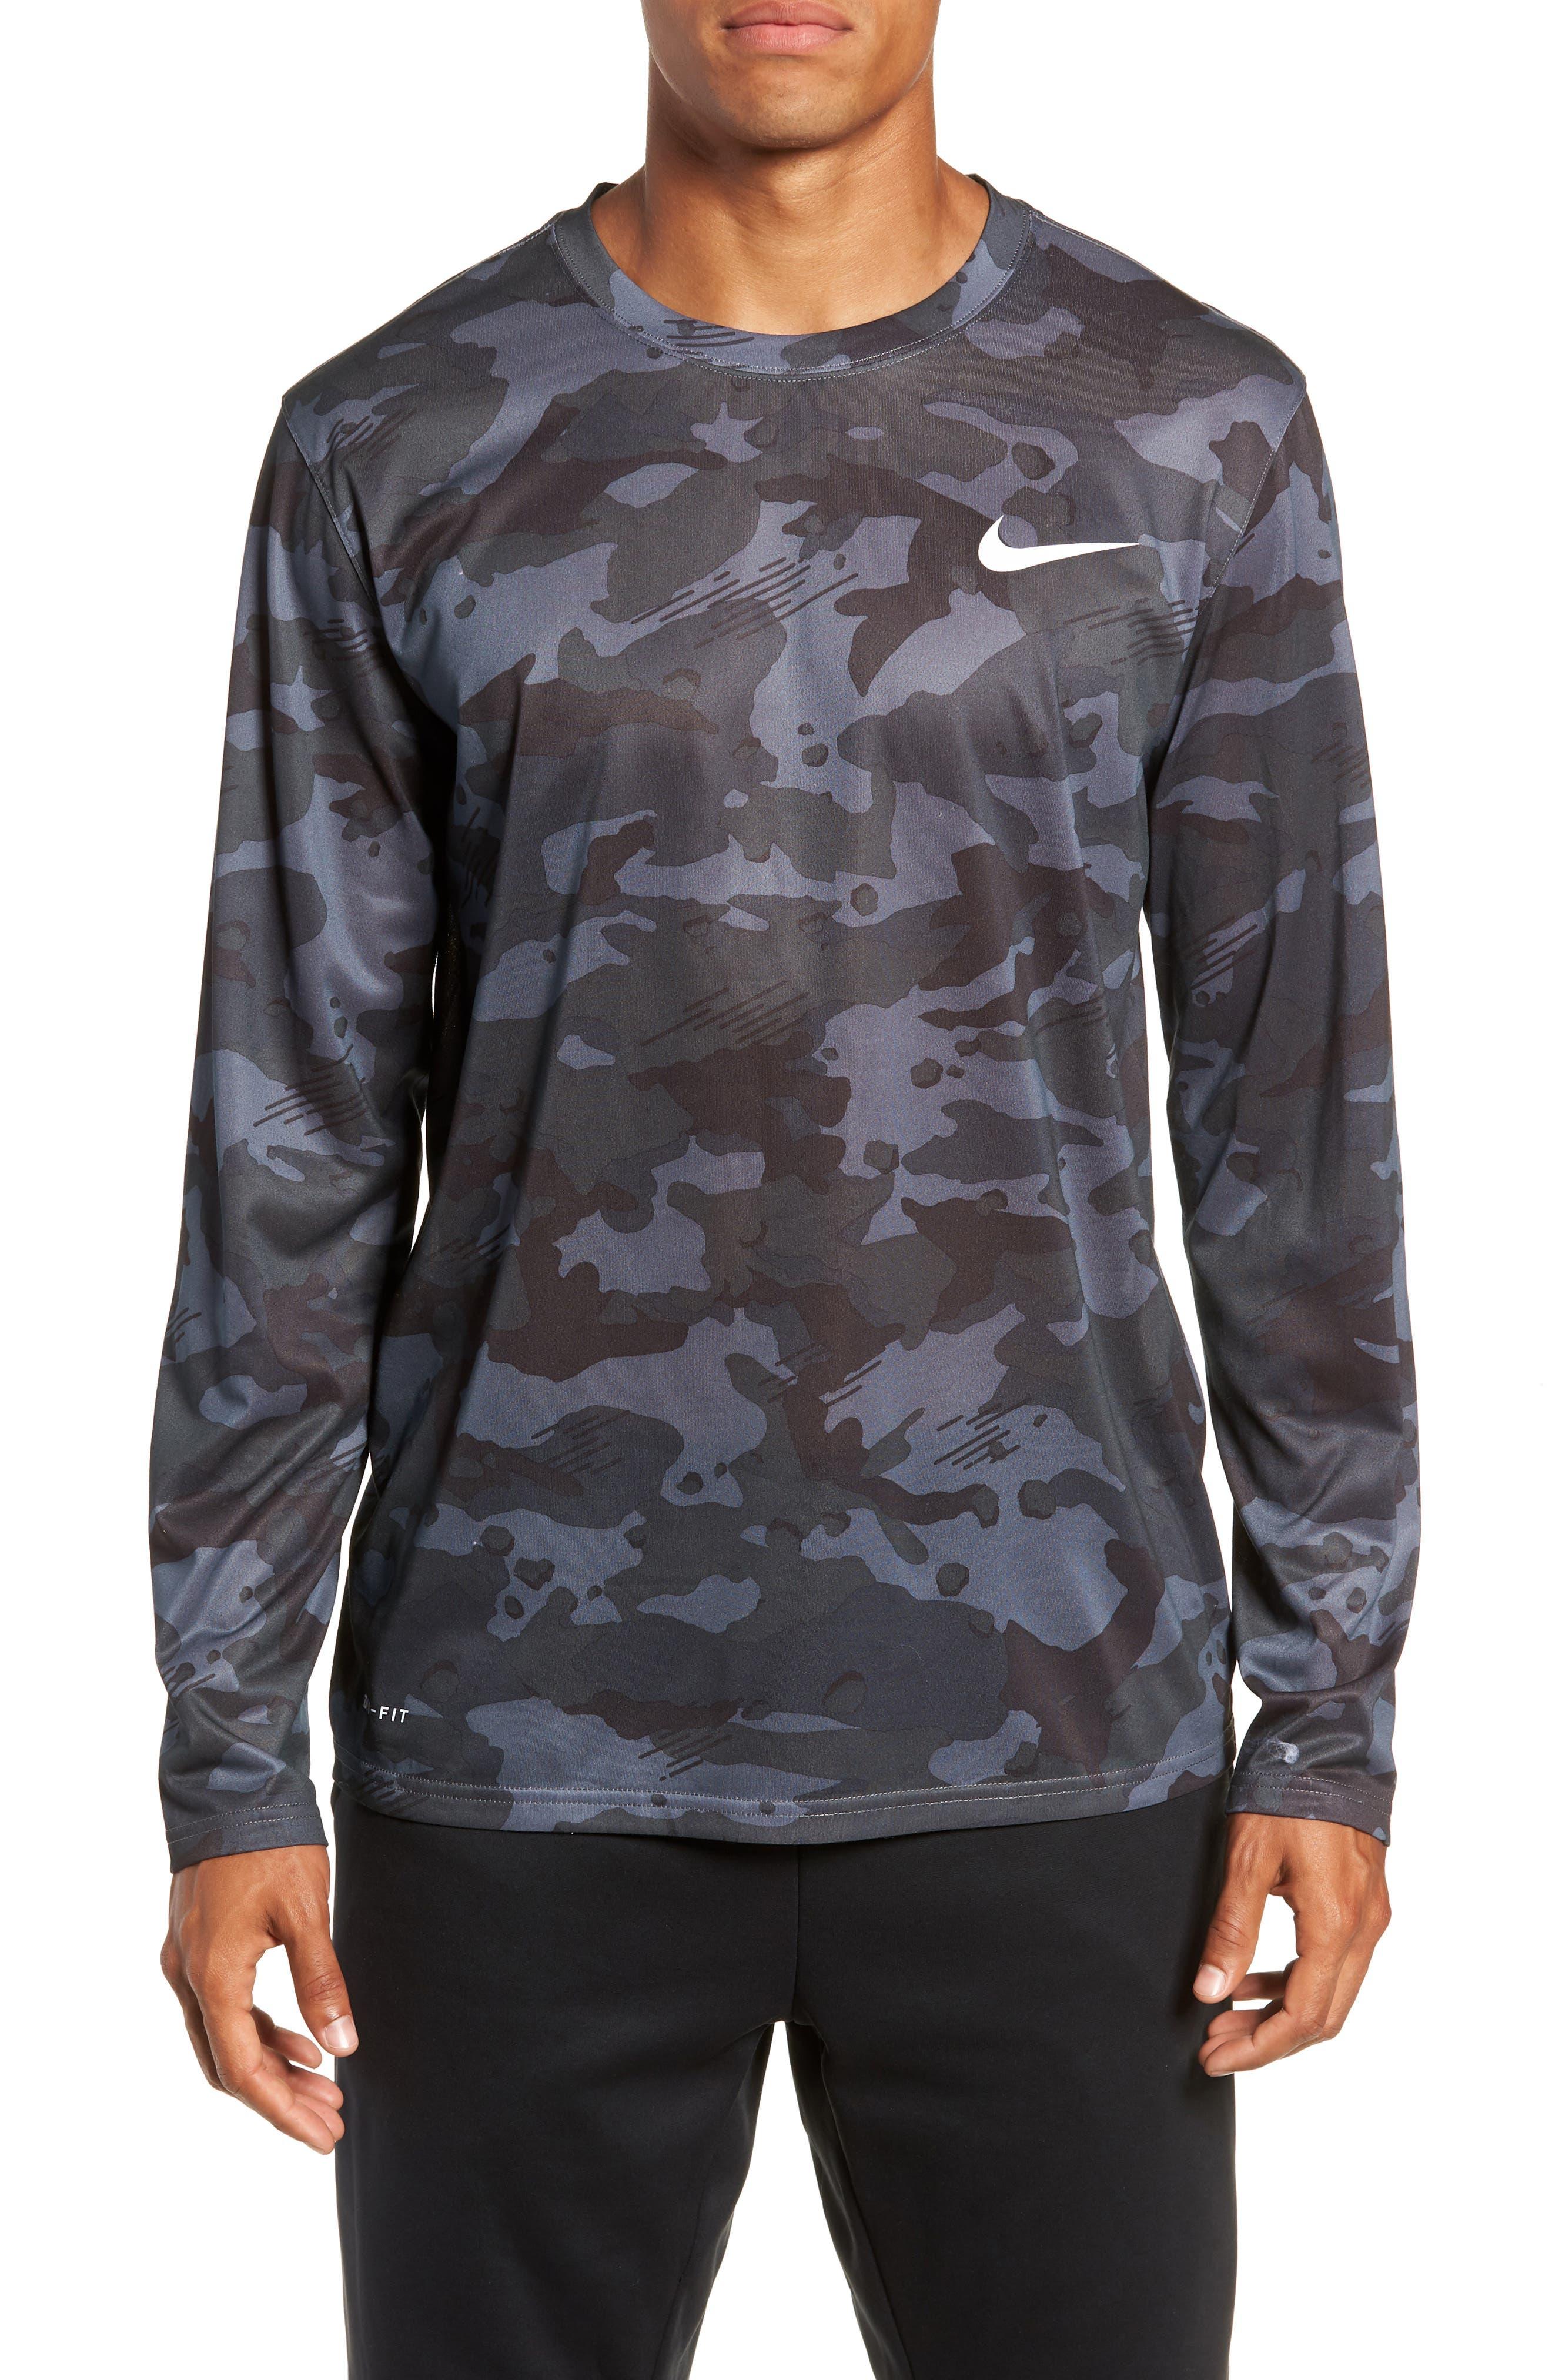 Nike Dry Long Sleeve Camo T-Shirt Grey